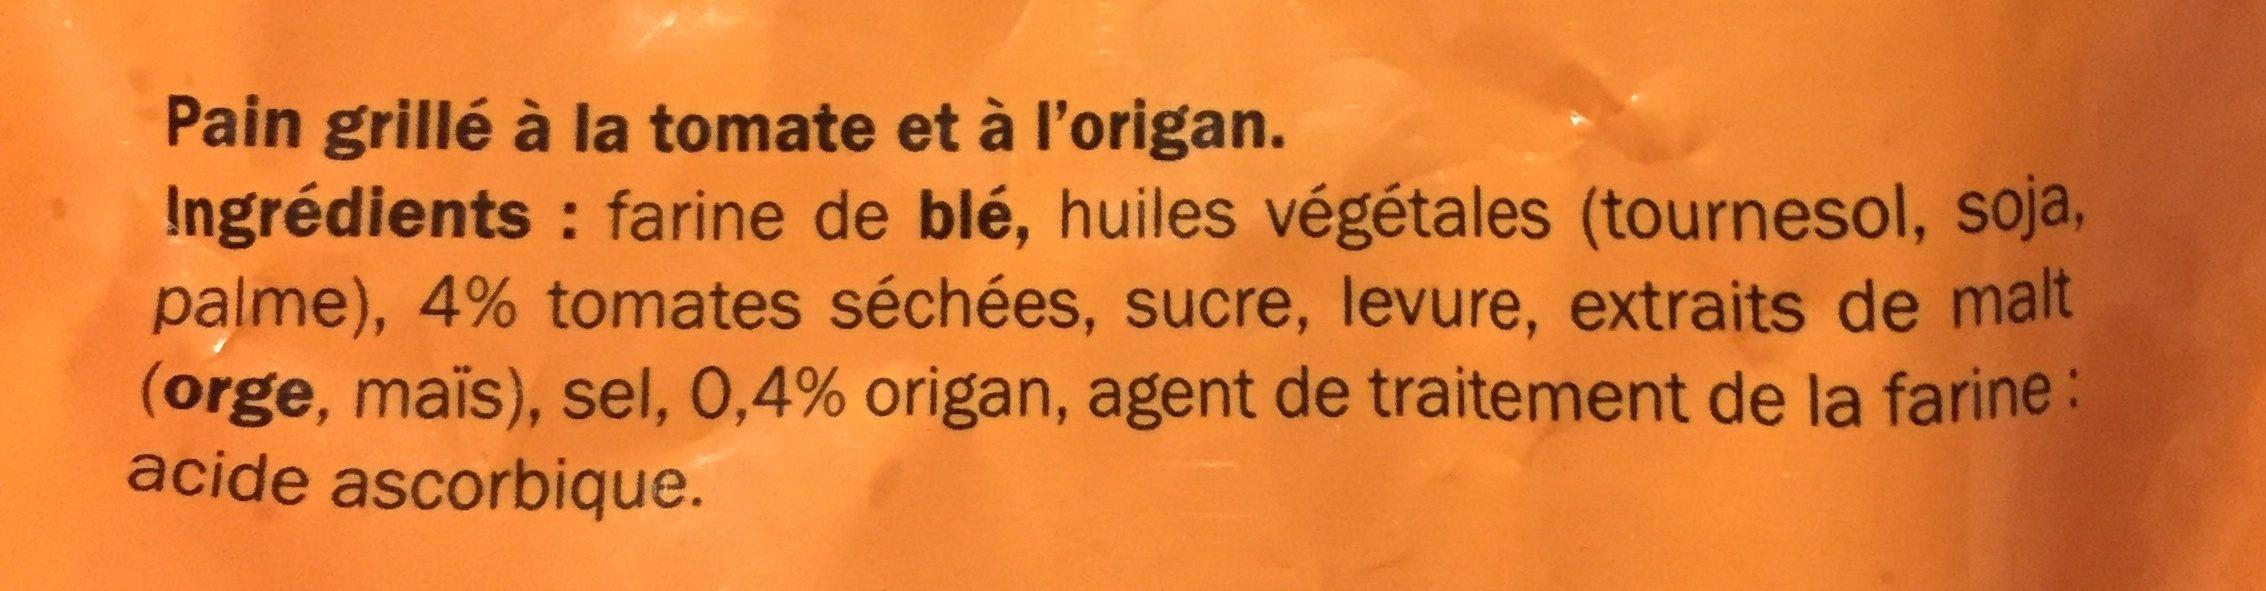 Pain grillé tomate & origan - Ingrediënten